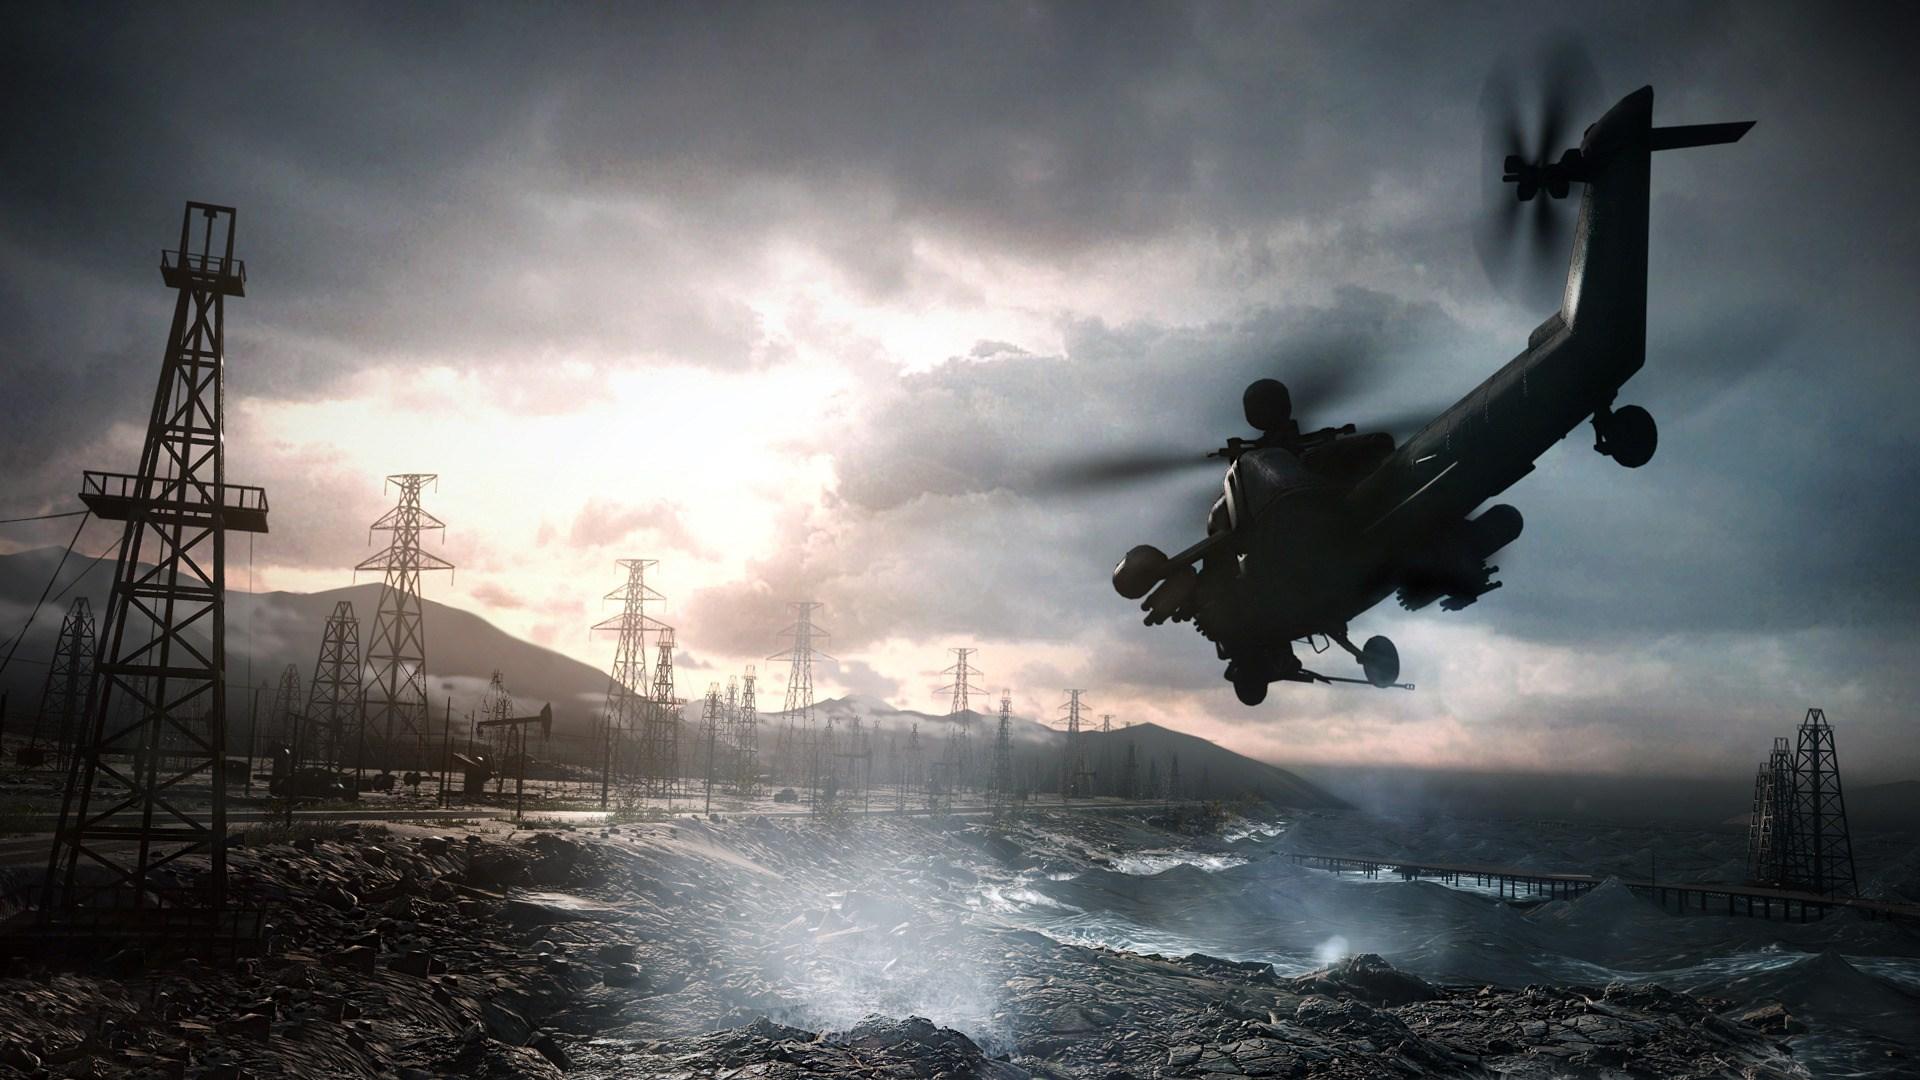 Battlefield 4 Computer Wallpapers, Desktop Backgrounds ...